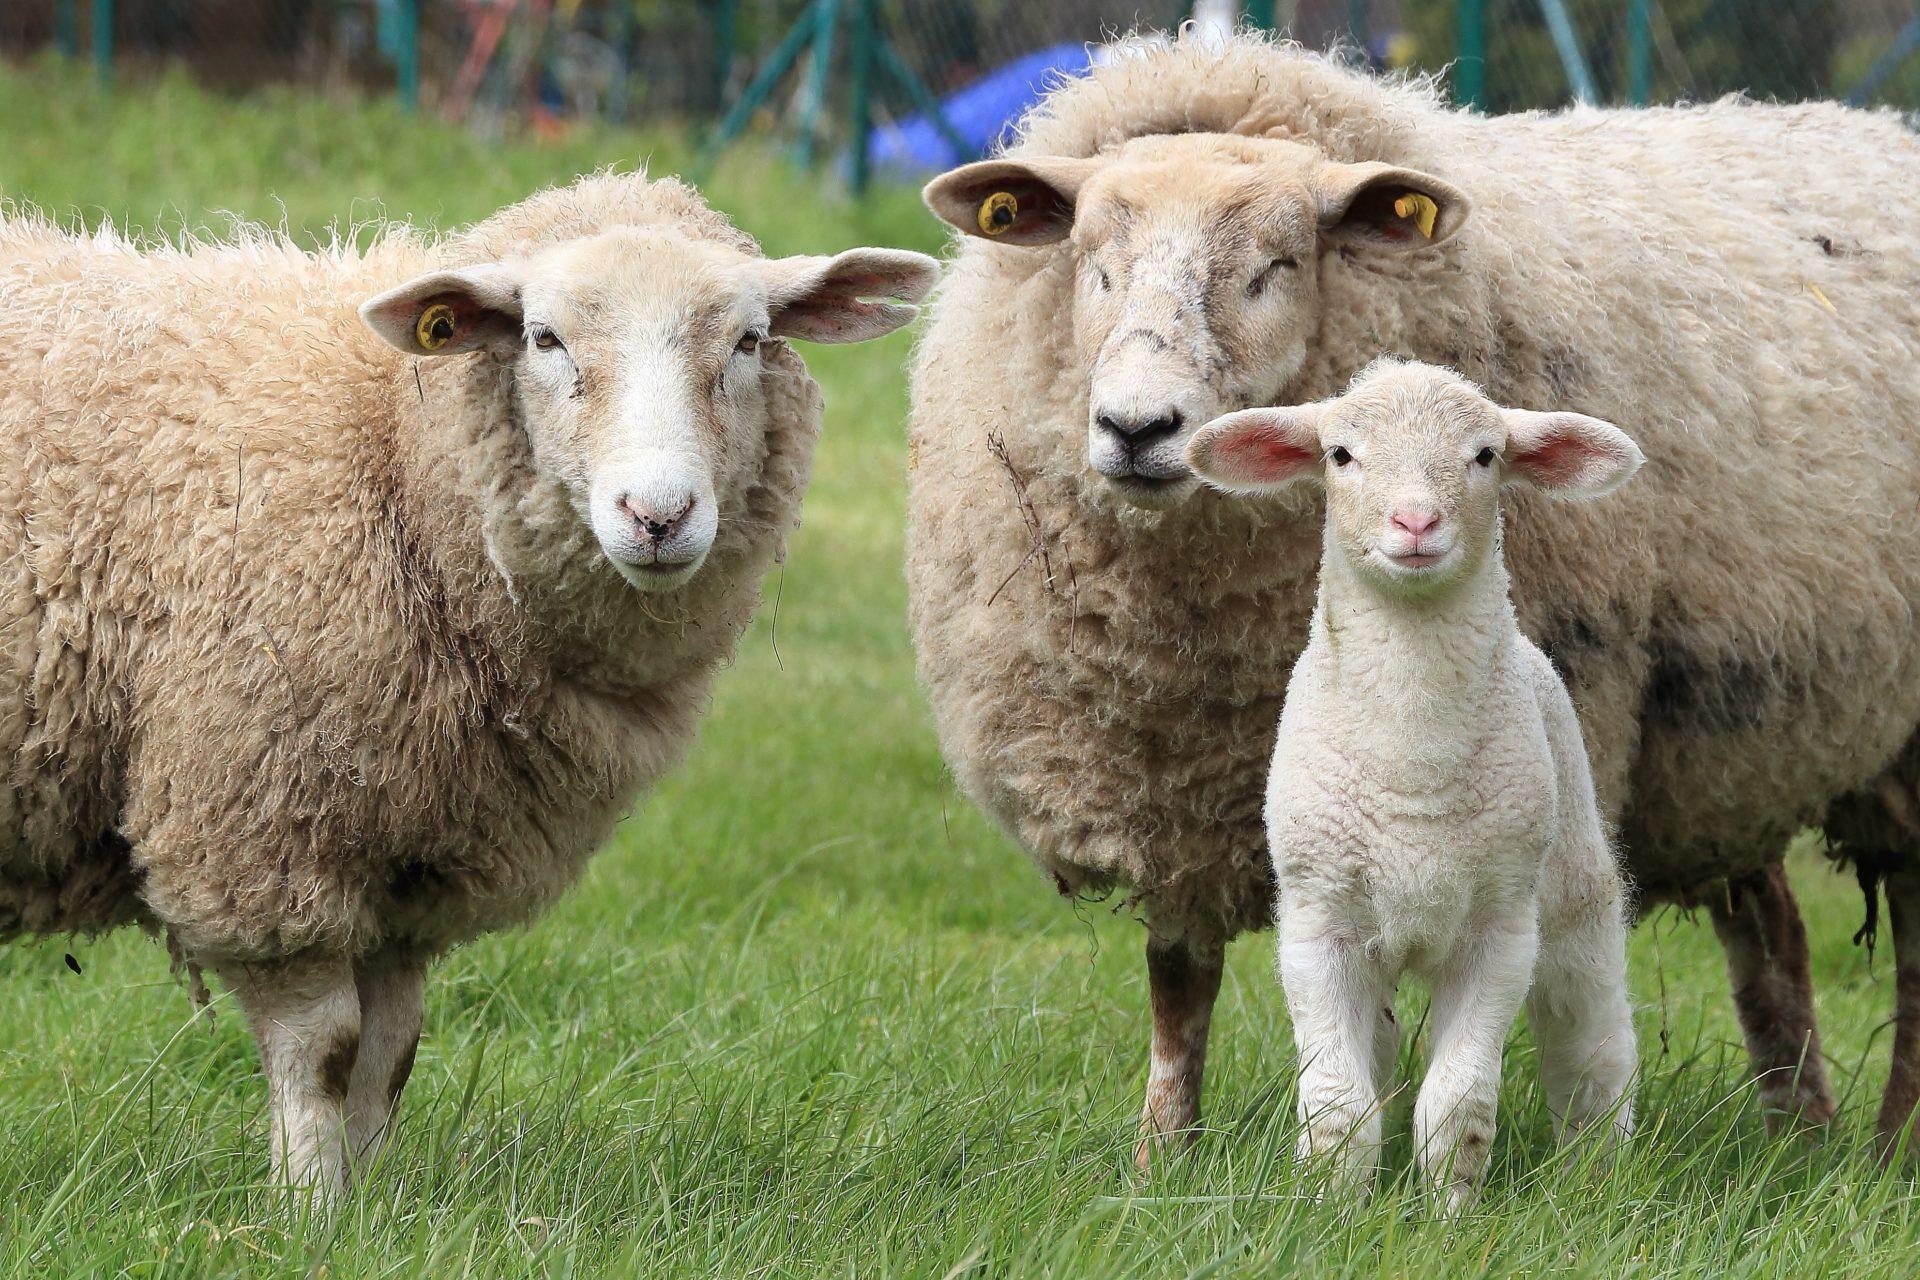 Sheep 1547720 1